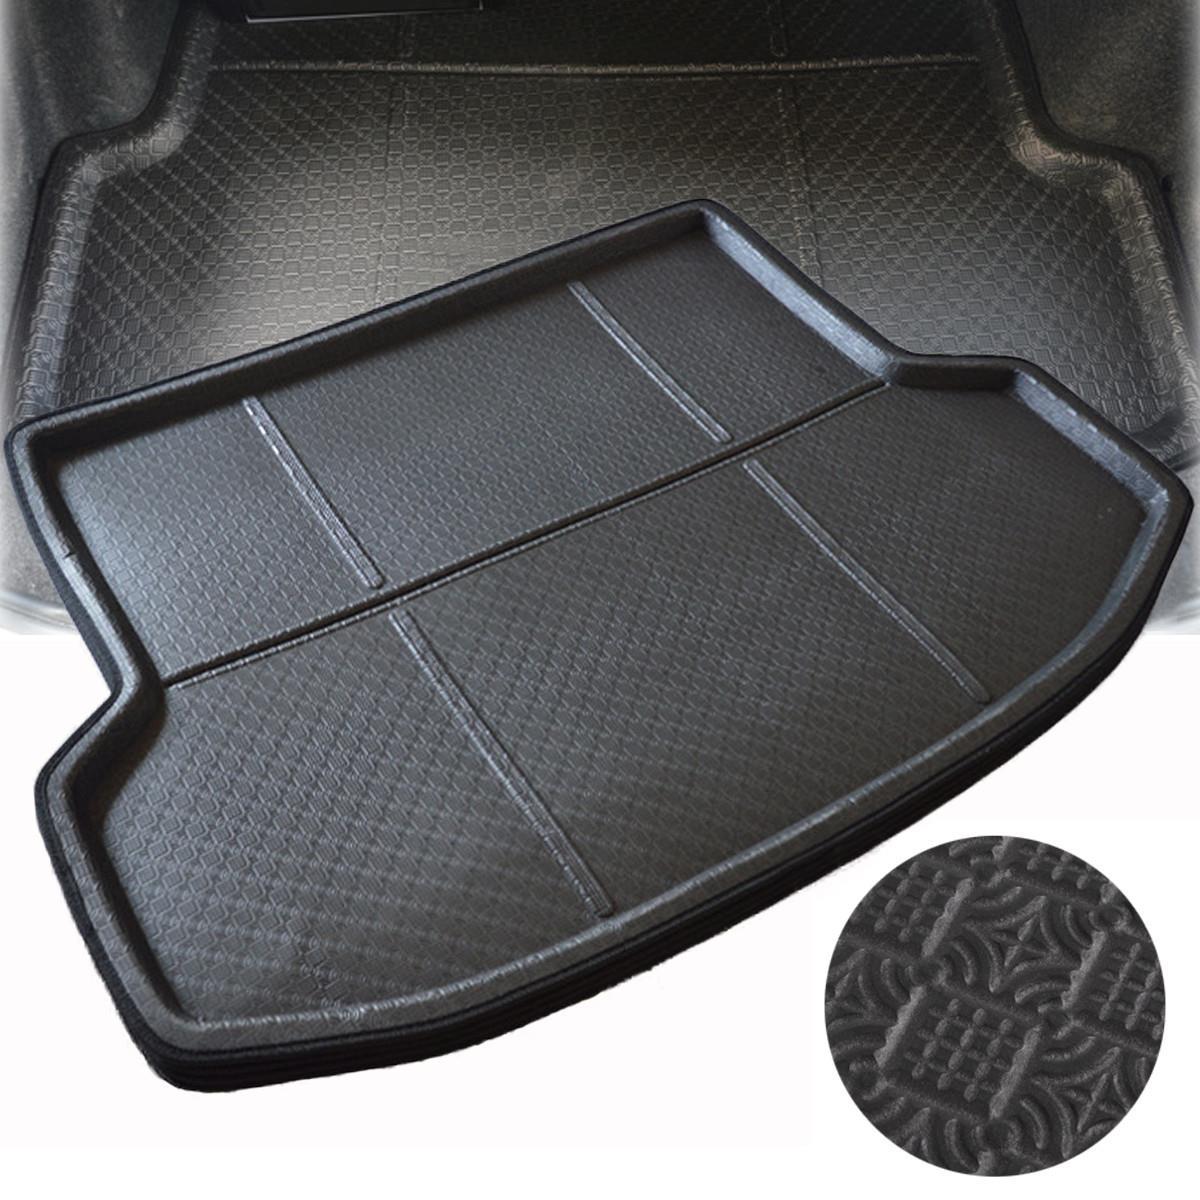 Rear Trunk Car Cargo Mat Floor Protector Waterproof Cargo Liner For Hyundai IX35 2010 2015 EVA